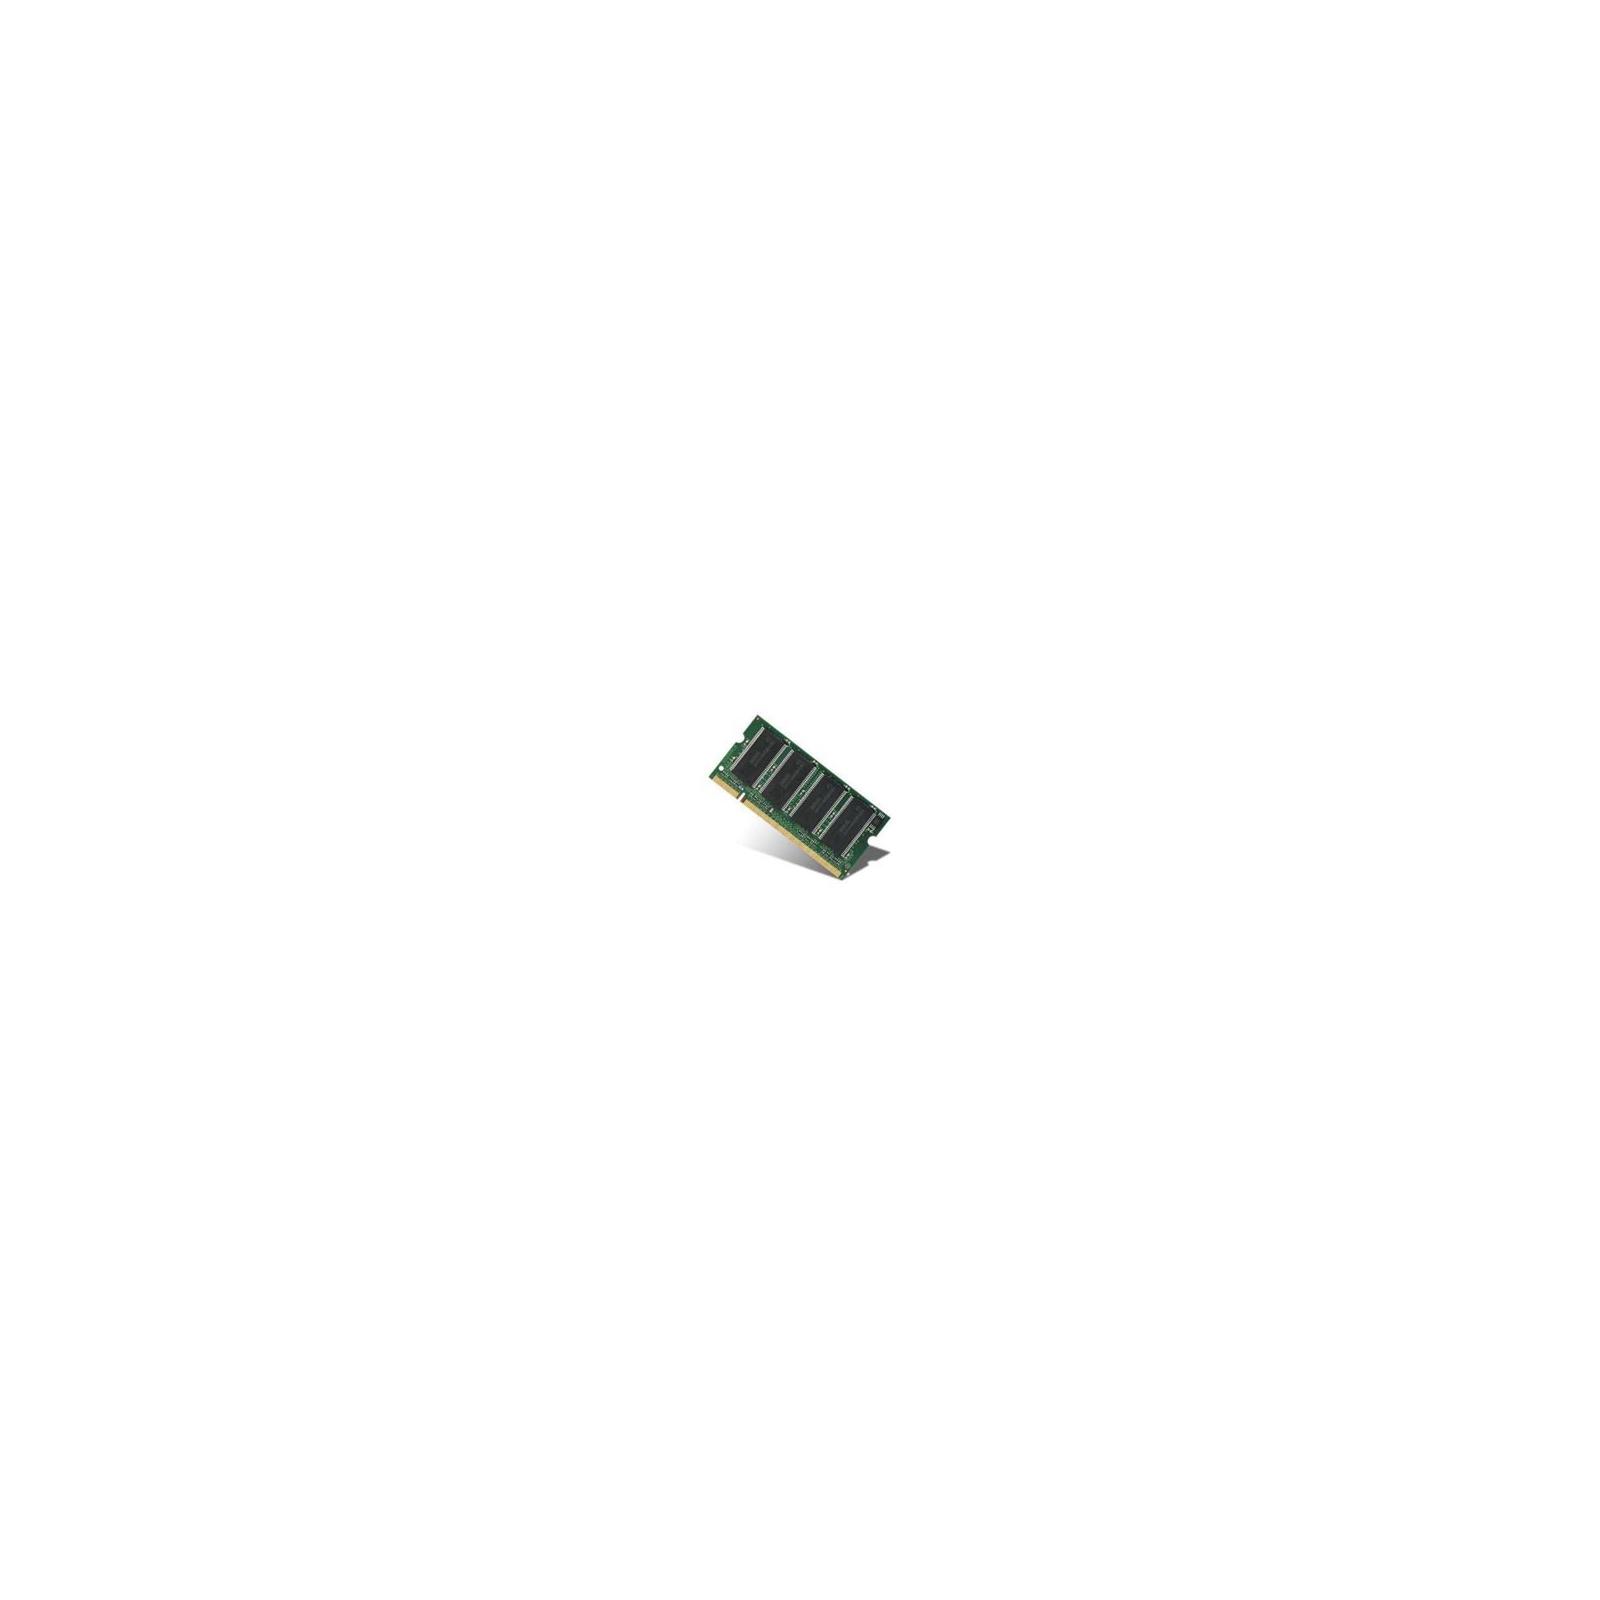 Модуль памяти для ноутбука SoDIMM DDR 1GB 400 MHz G.Skill (F1-3200CL3S-1GBSA)